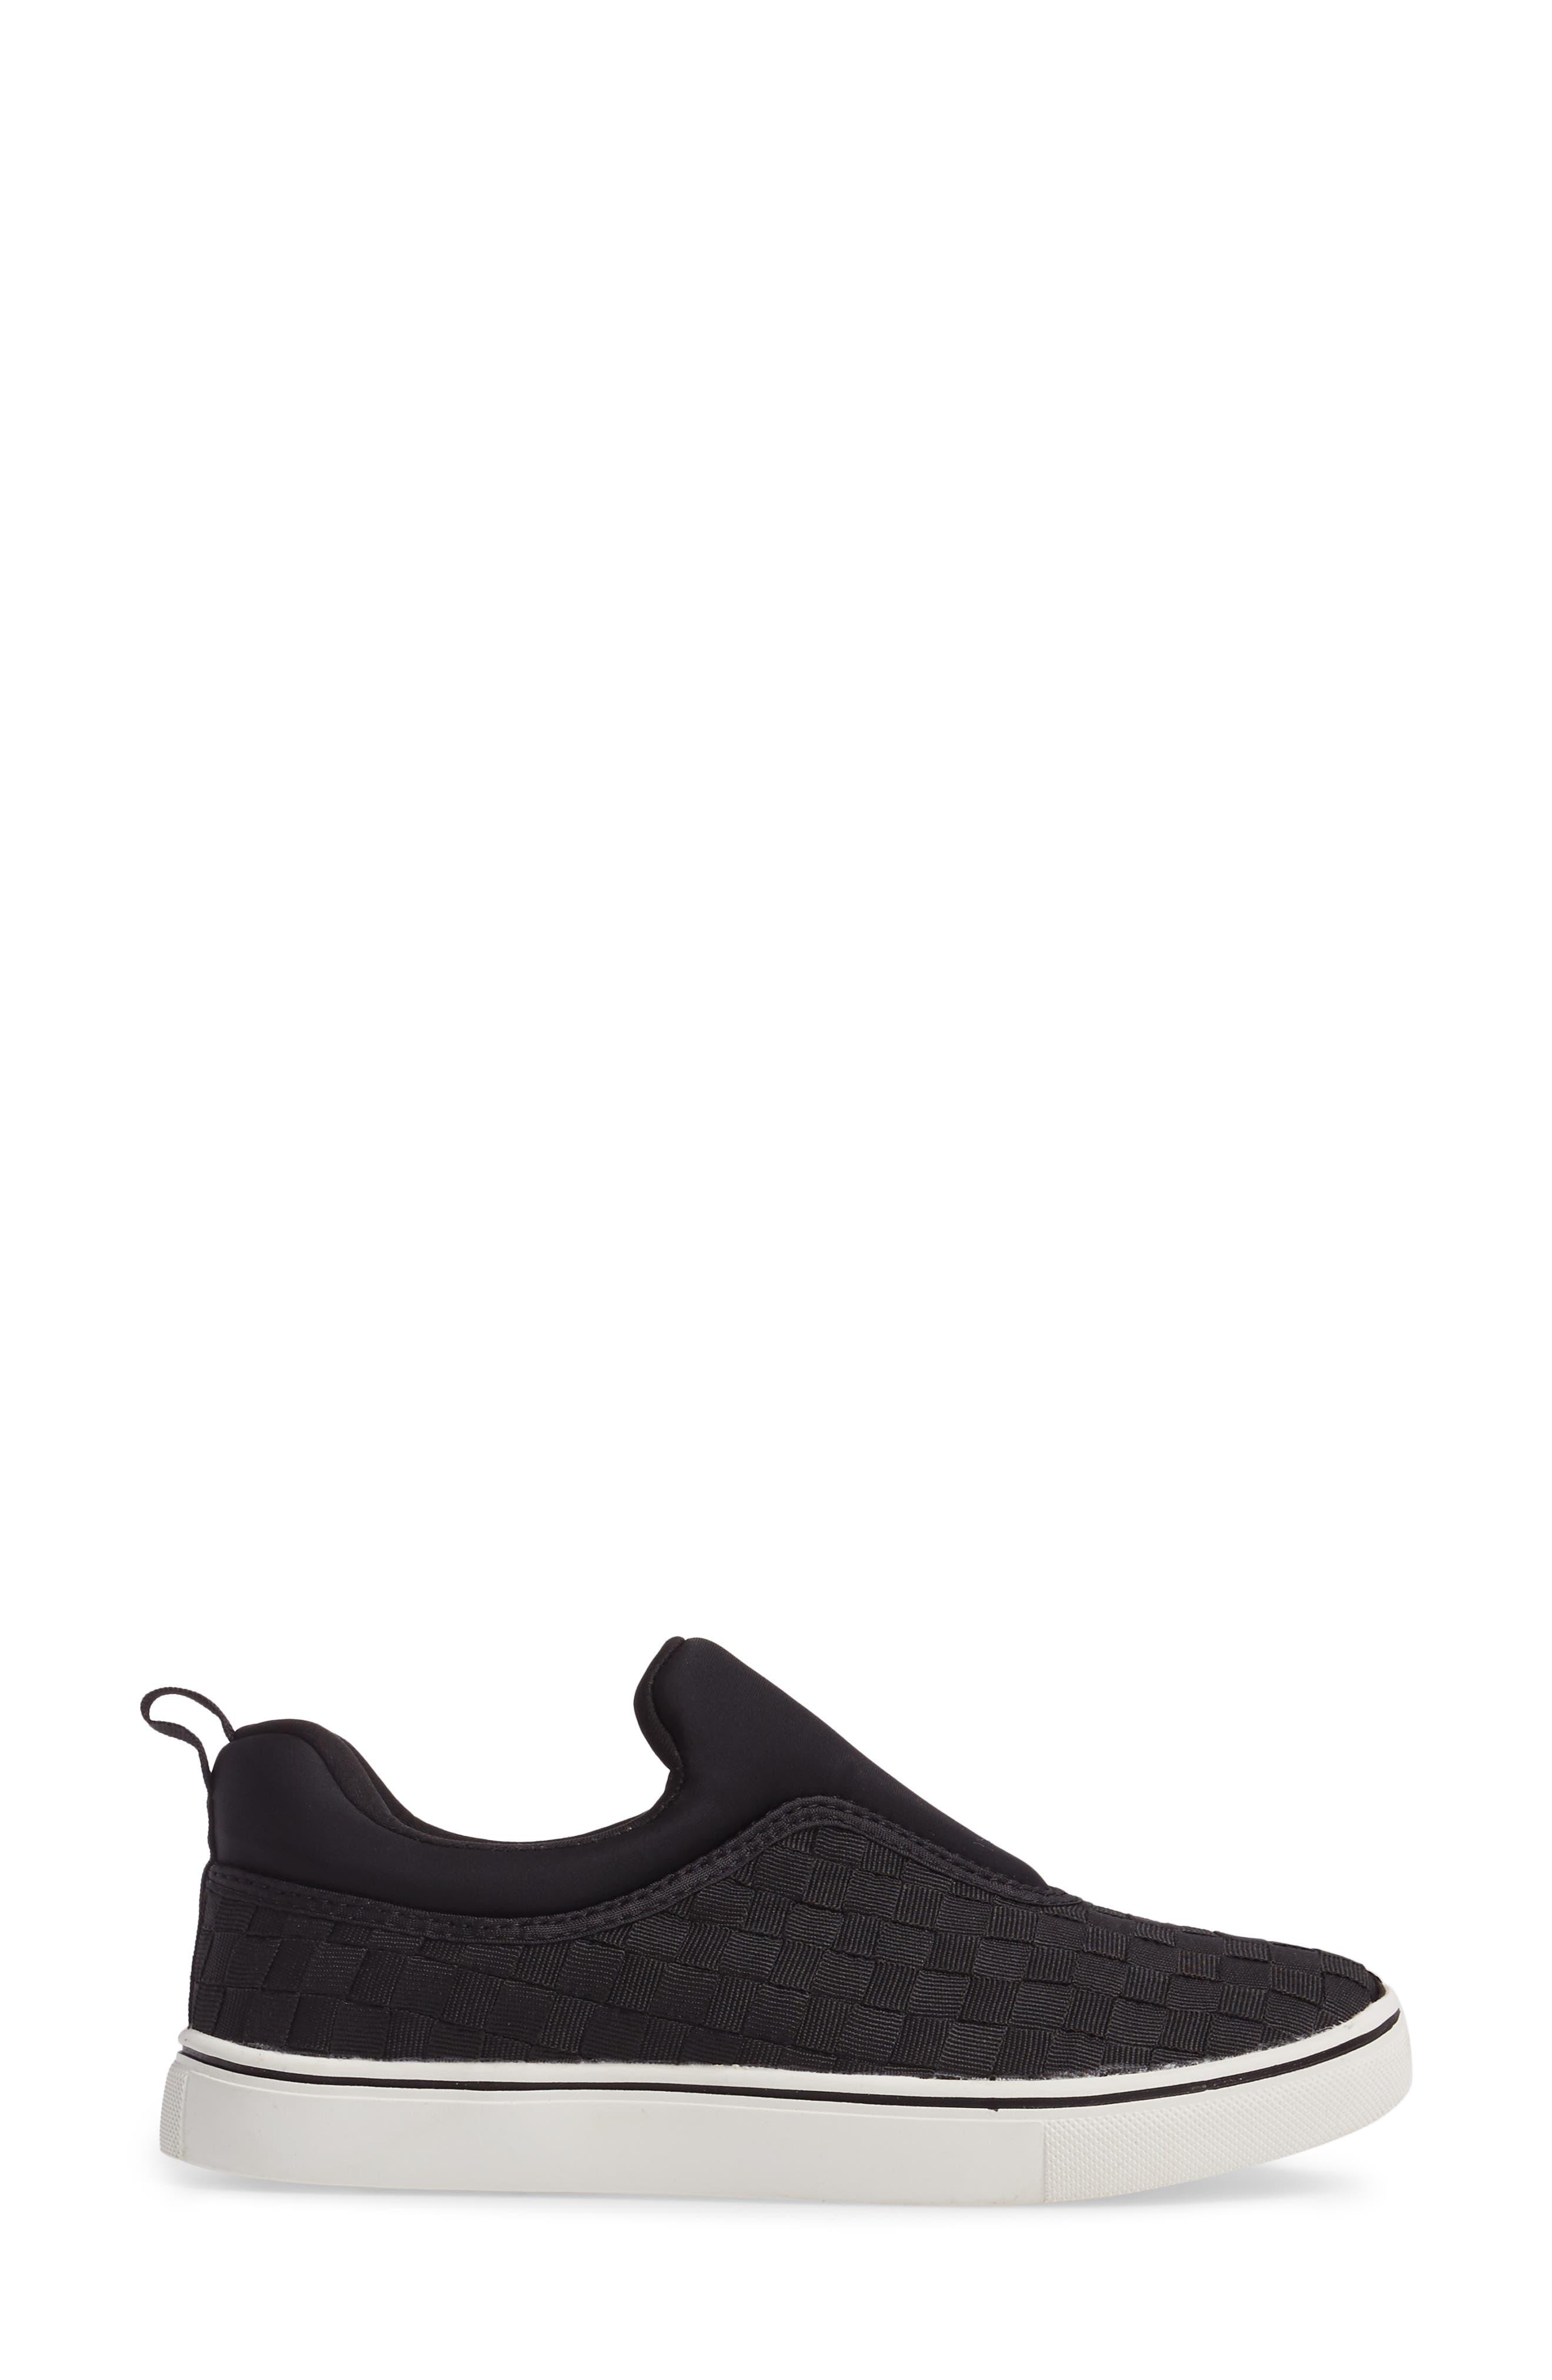 Bernie Mev Joan Slip-On Sneaker,                             Alternate thumbnail 3, color,                             BLACK/ BLACK FABRIC